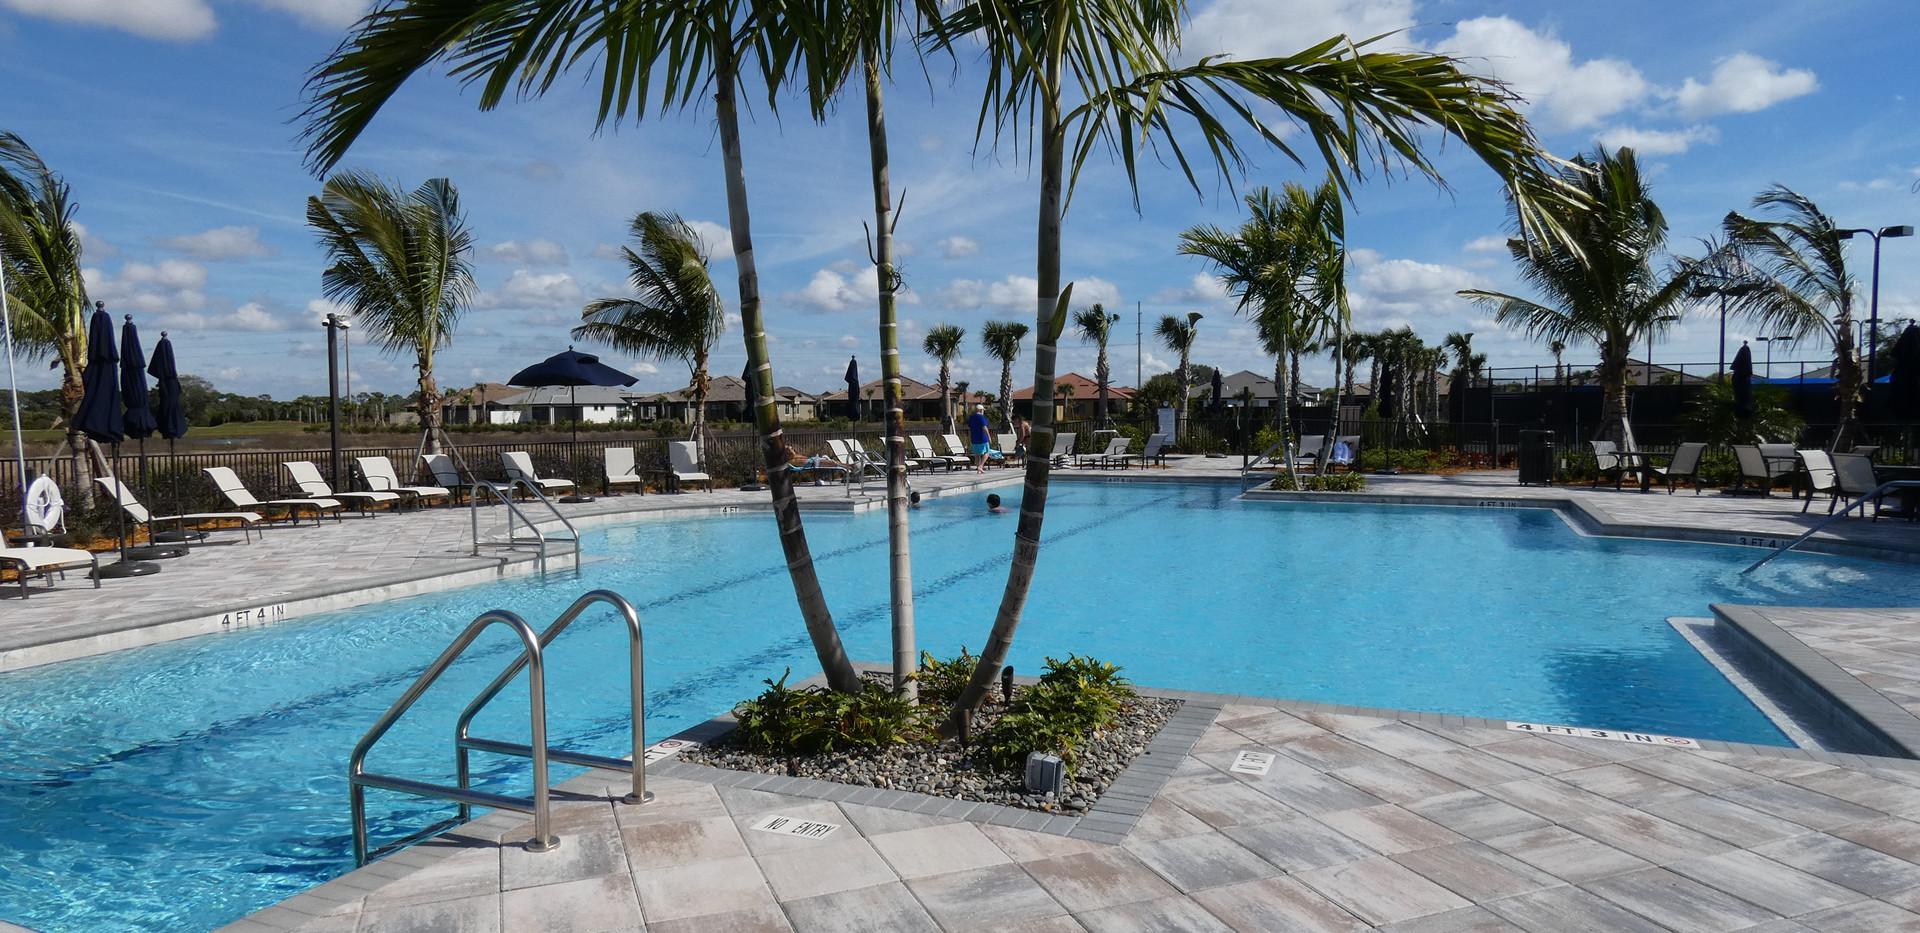 Hammock Preserve Sarasota pool